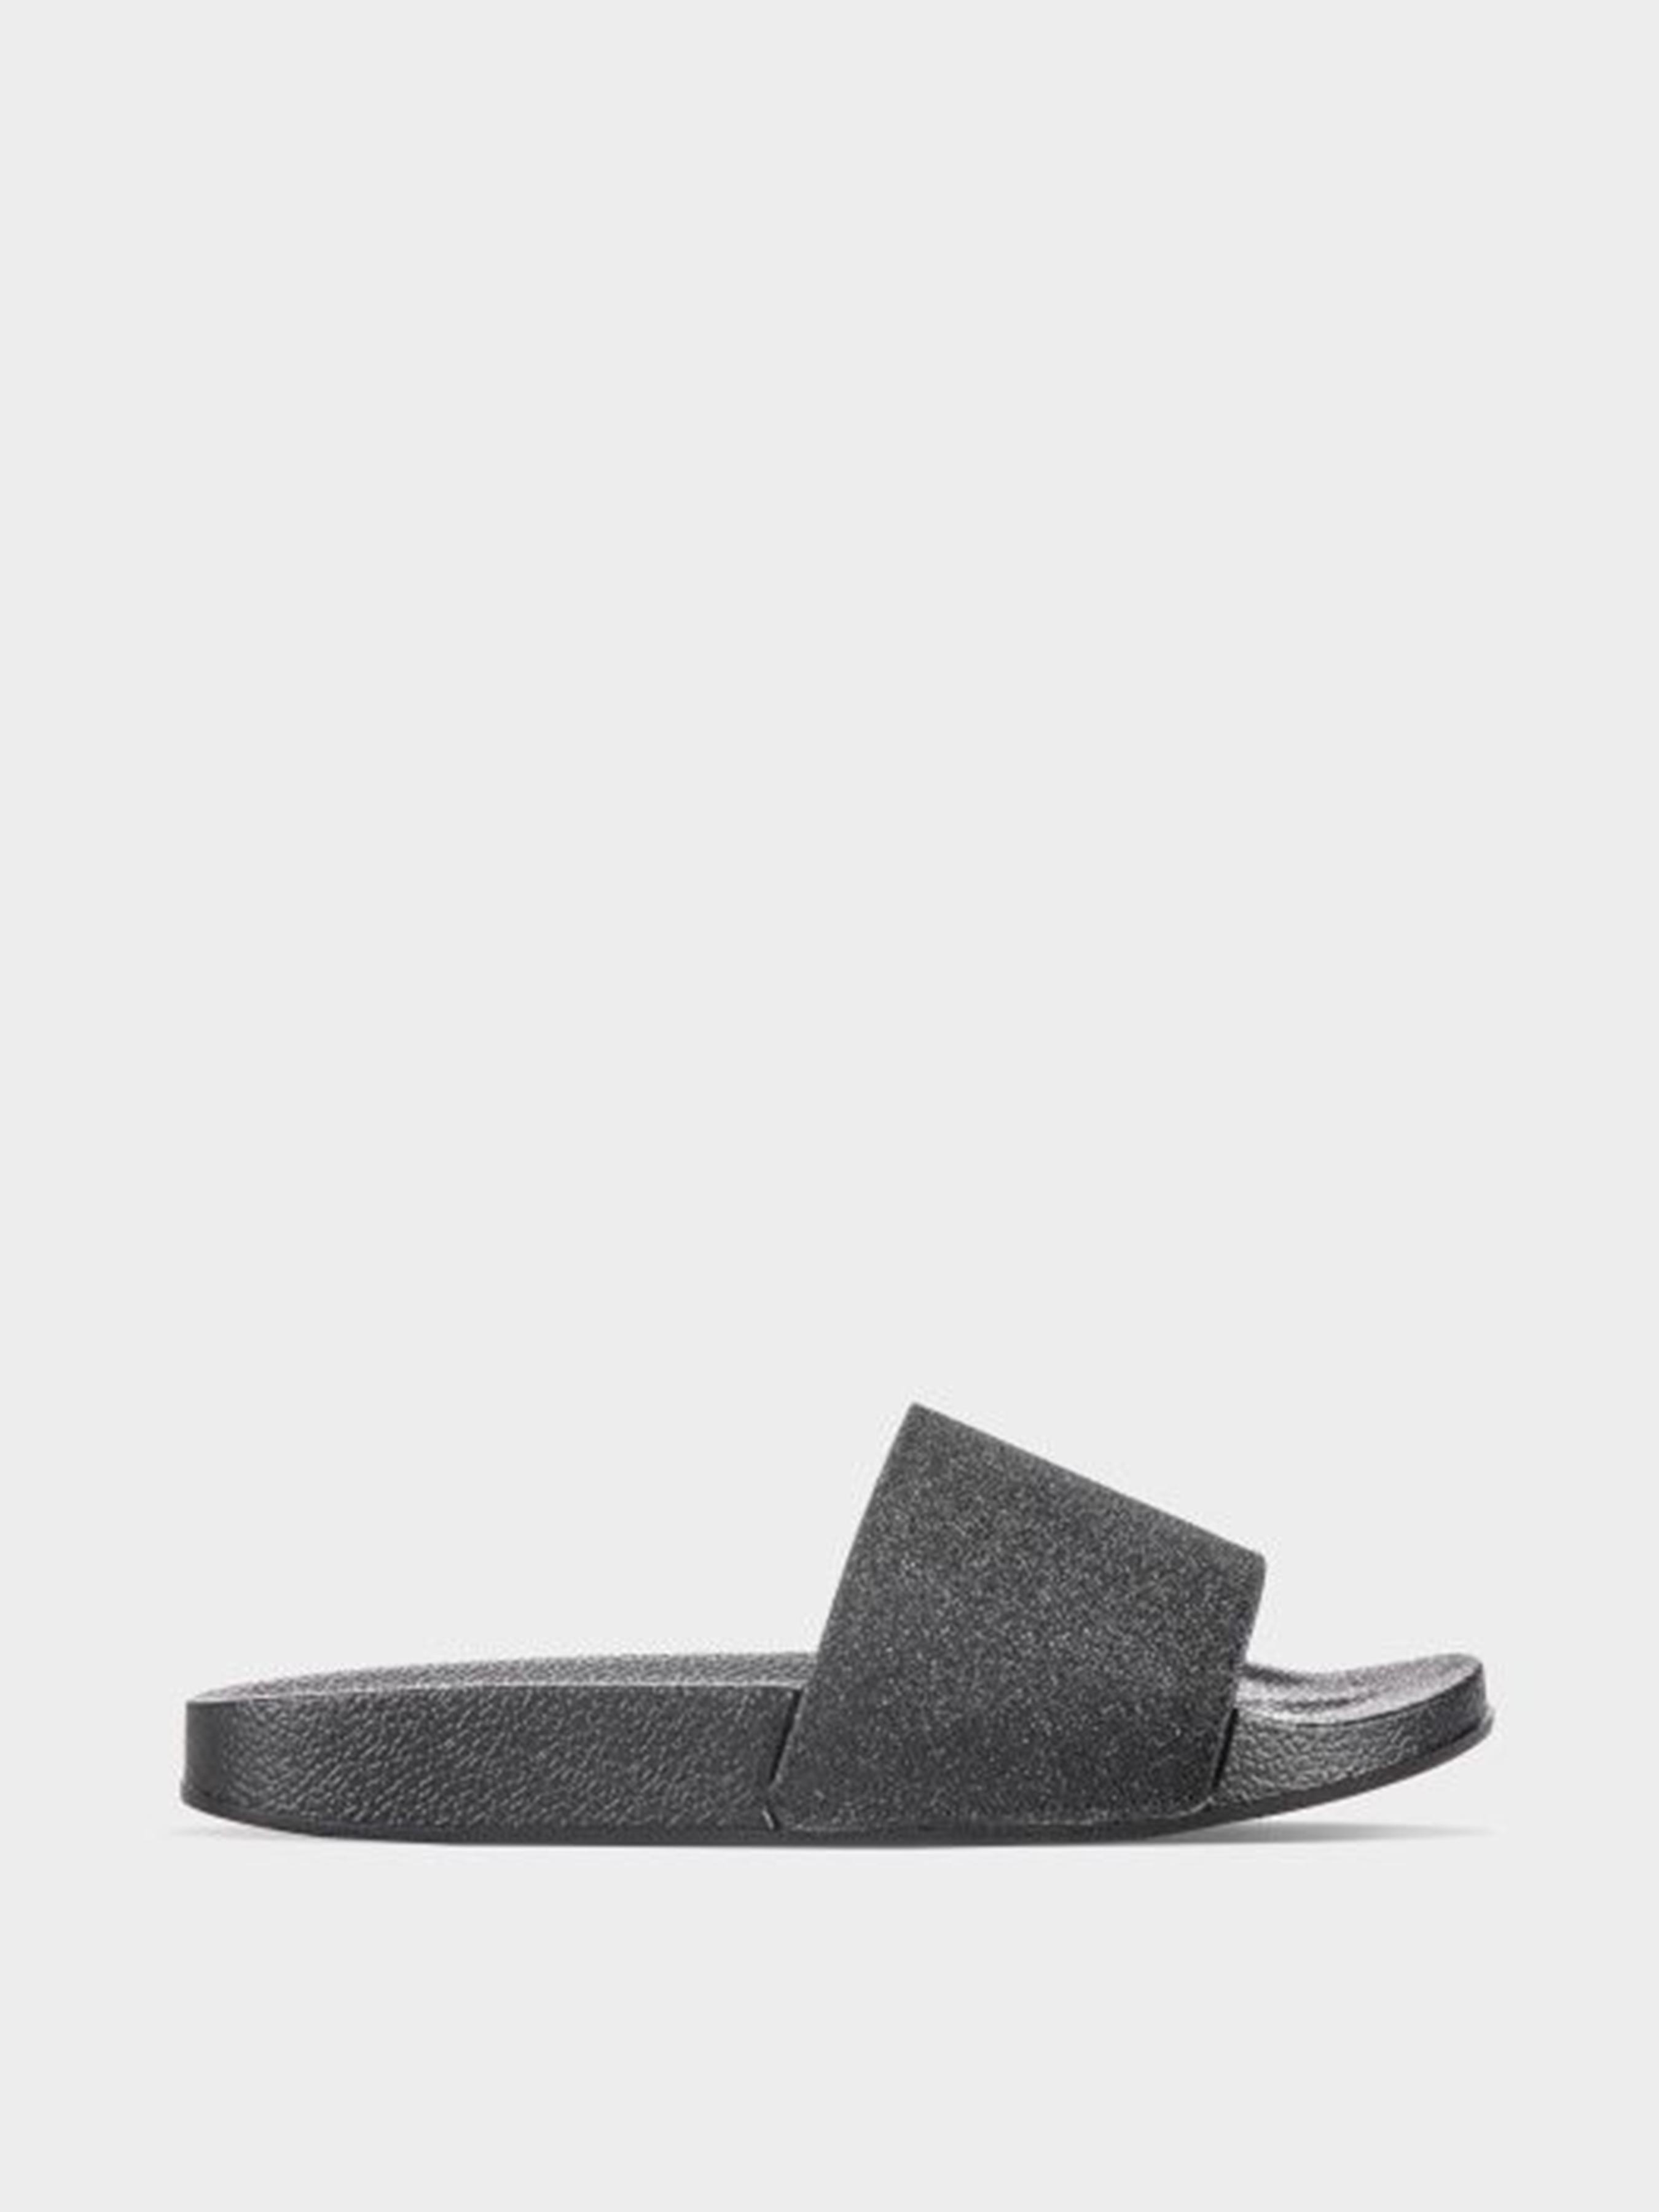 Шлёпанцы для женщин Braska BS3124 размерная сетка обуви, 2017